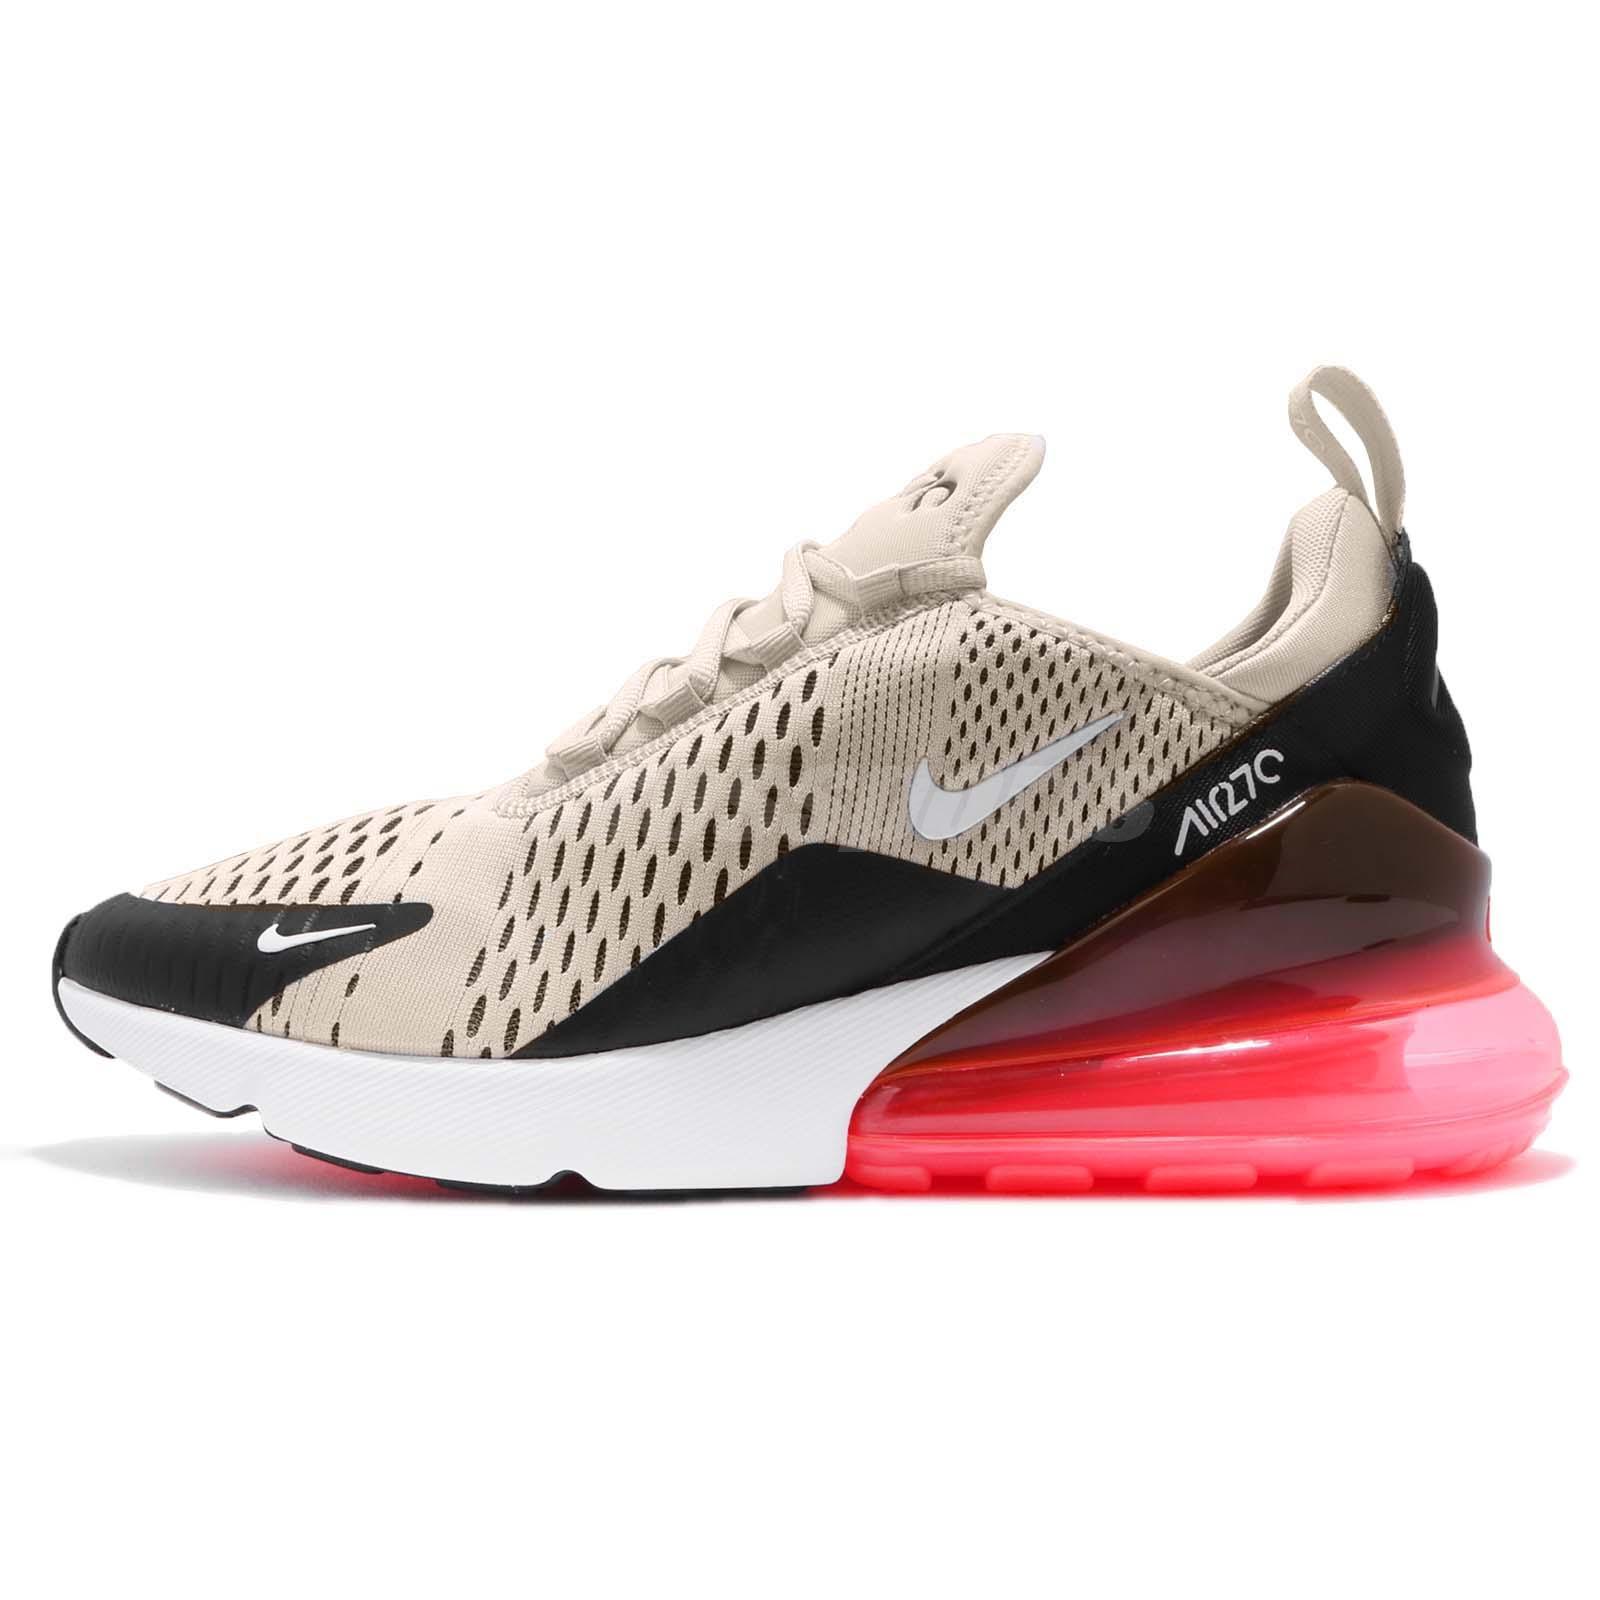 Nike Air Max 270 Black Light Bone Hot Punch Men Running Shoes Sneaker  AH8050-003